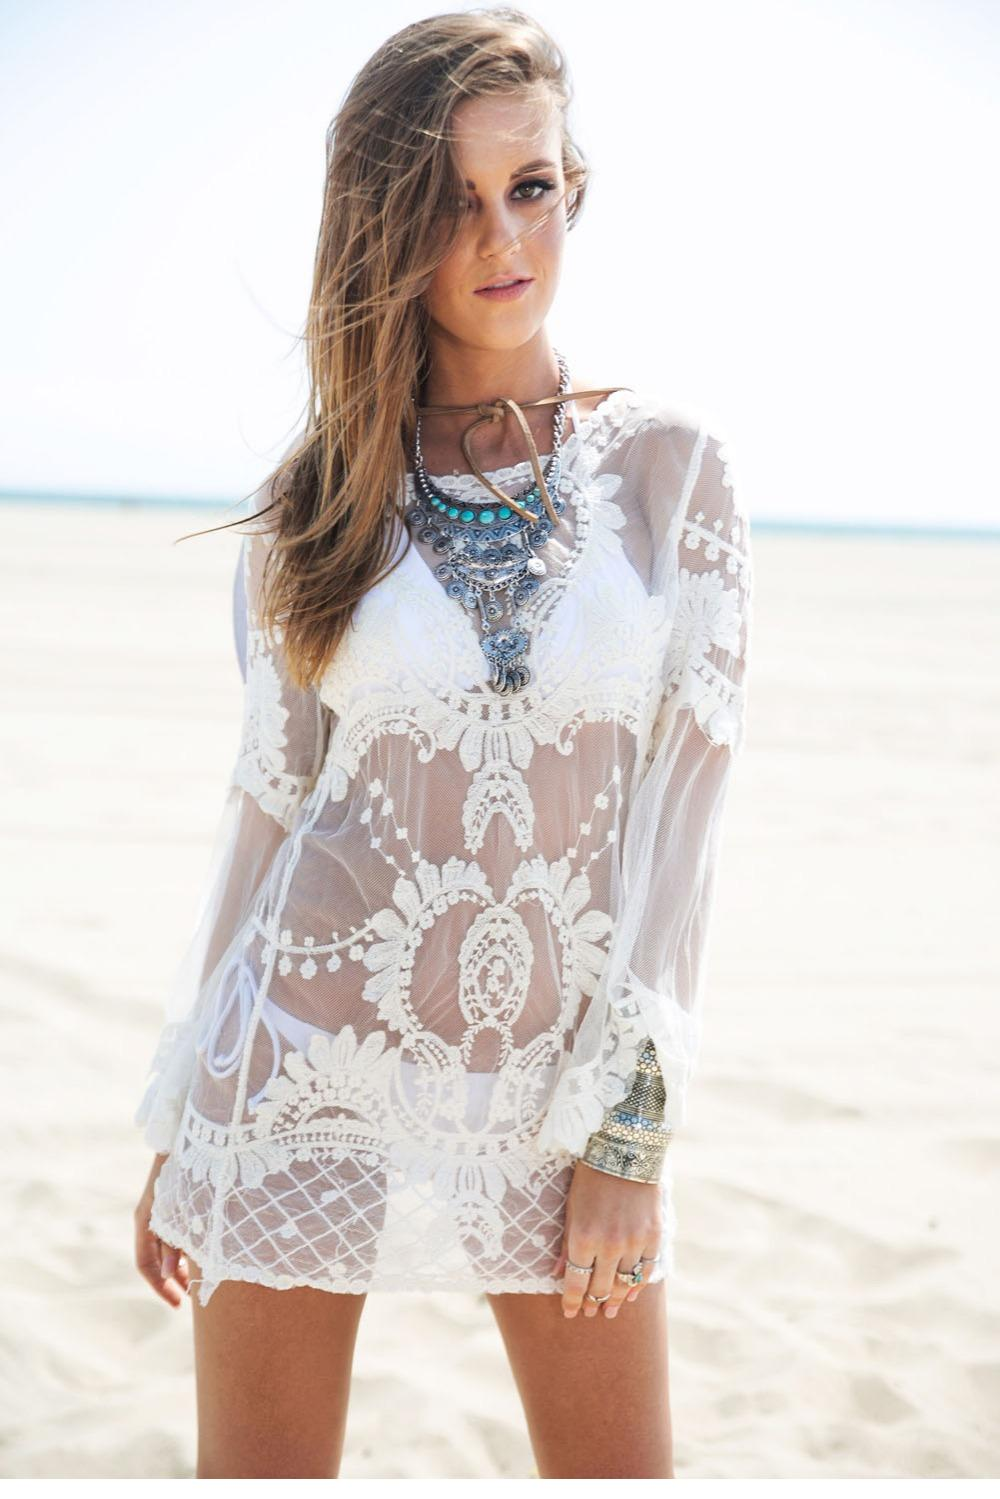 599eaf132c145 Get Quotations · Tapados De Mujer 2015 Summer Style Sexy White Long Sleeve  Saidas De Praia Crochet Beach Swimsuit